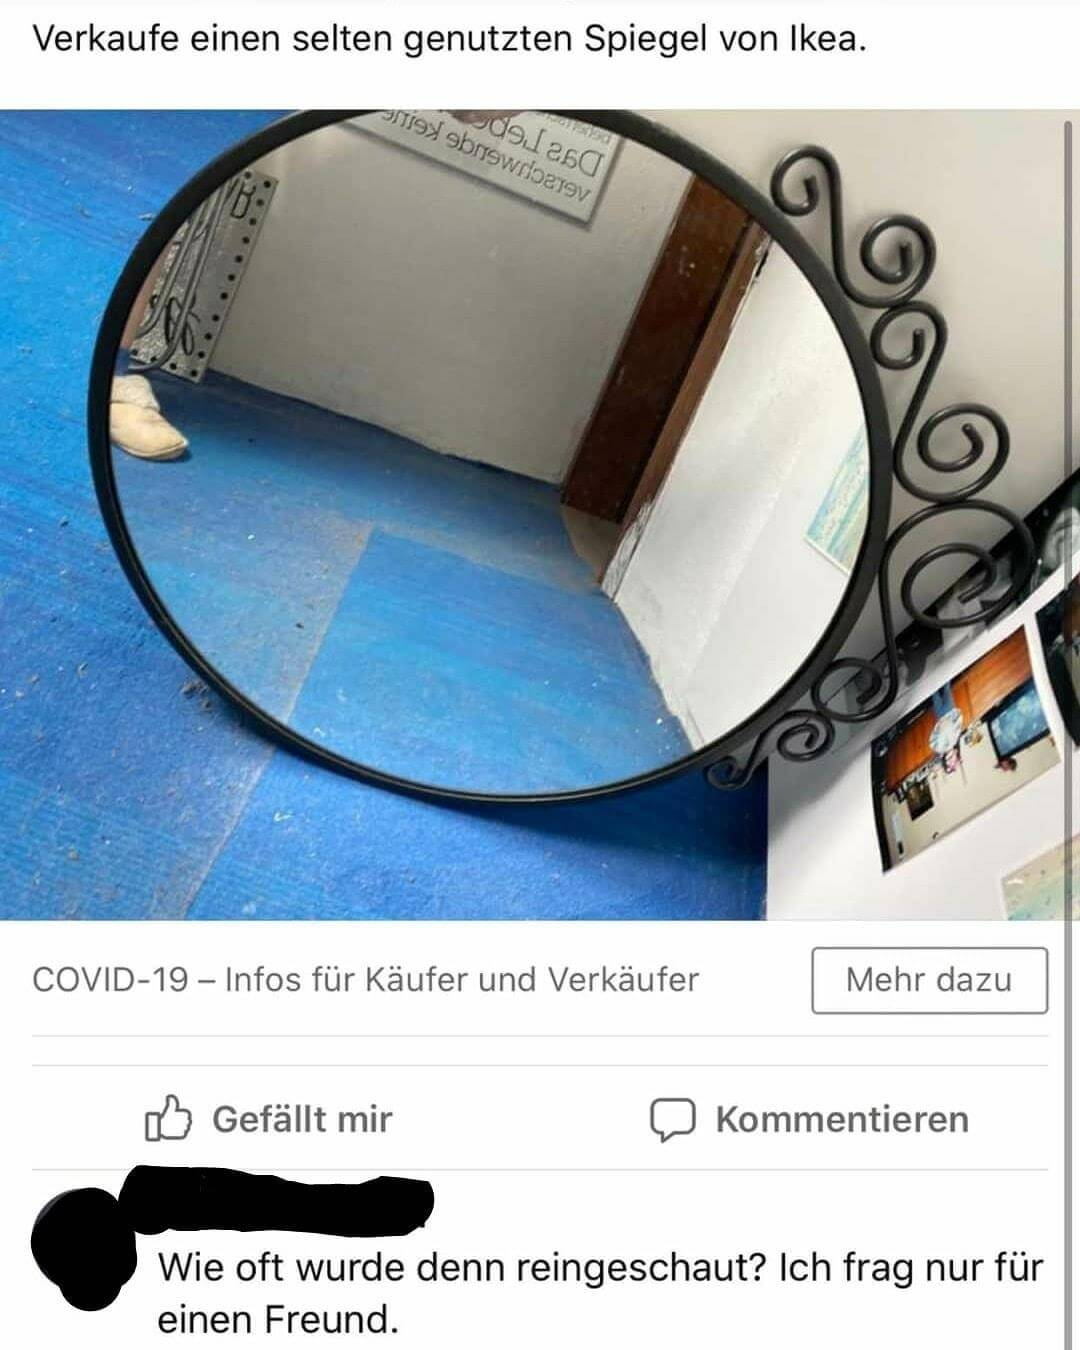 Bilderparade DCXV LangweileDich.net_Bilderparade_DCXV_08